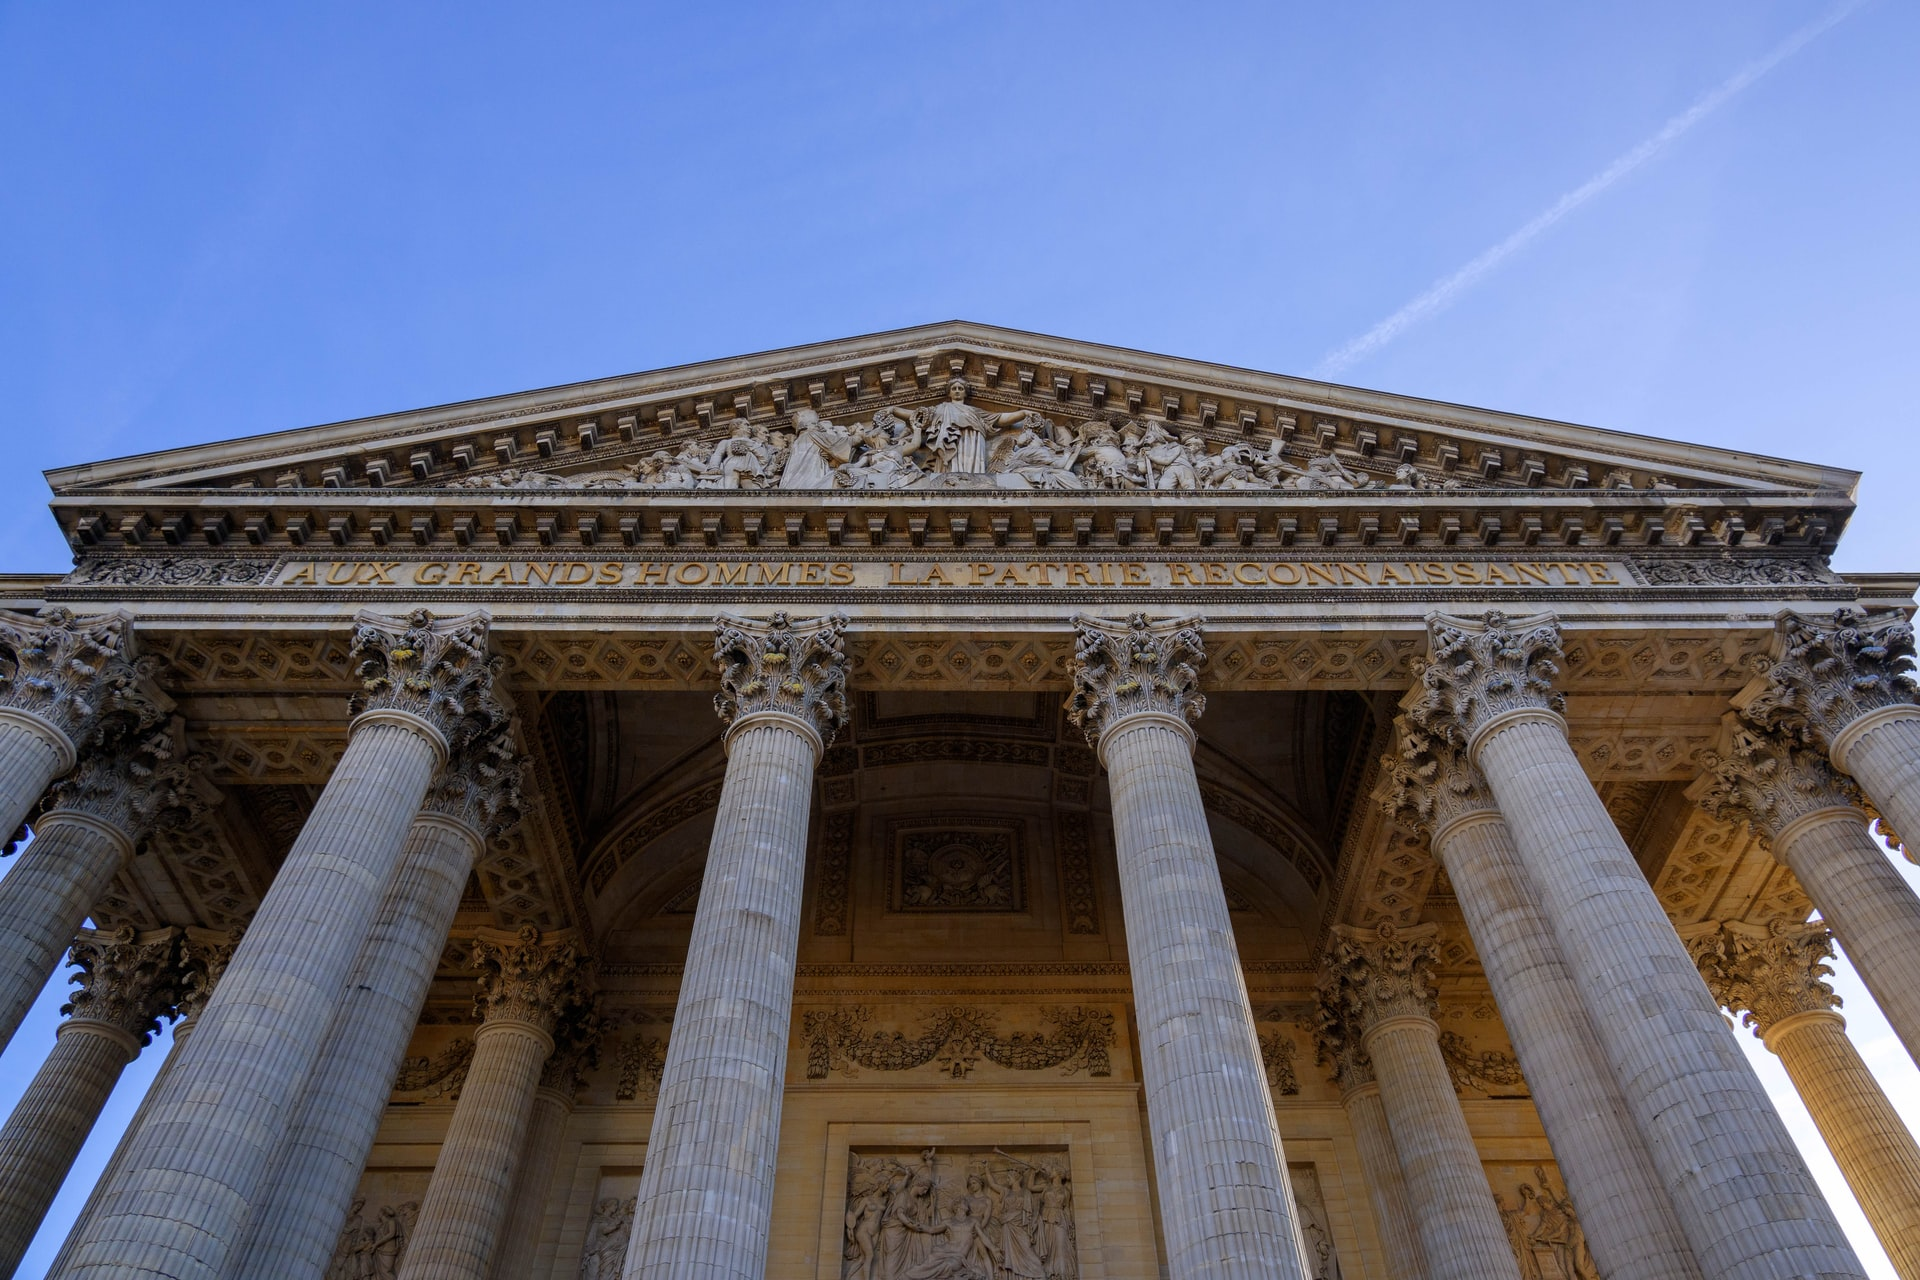 Pantheon columns on the facade at the Place du Pantheon